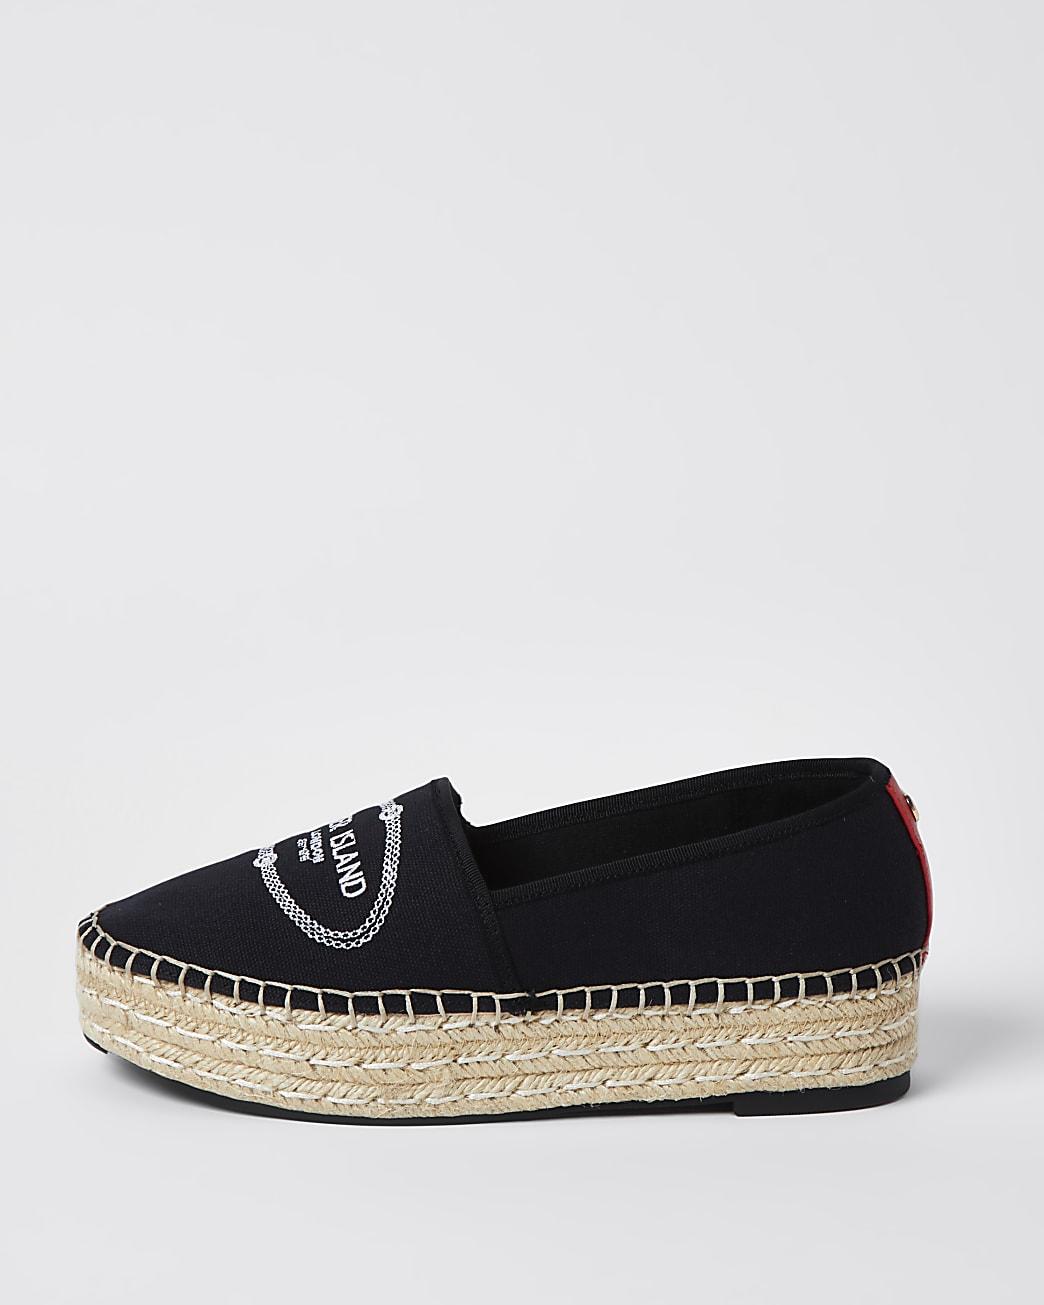 Black RI woven espadrille shoes